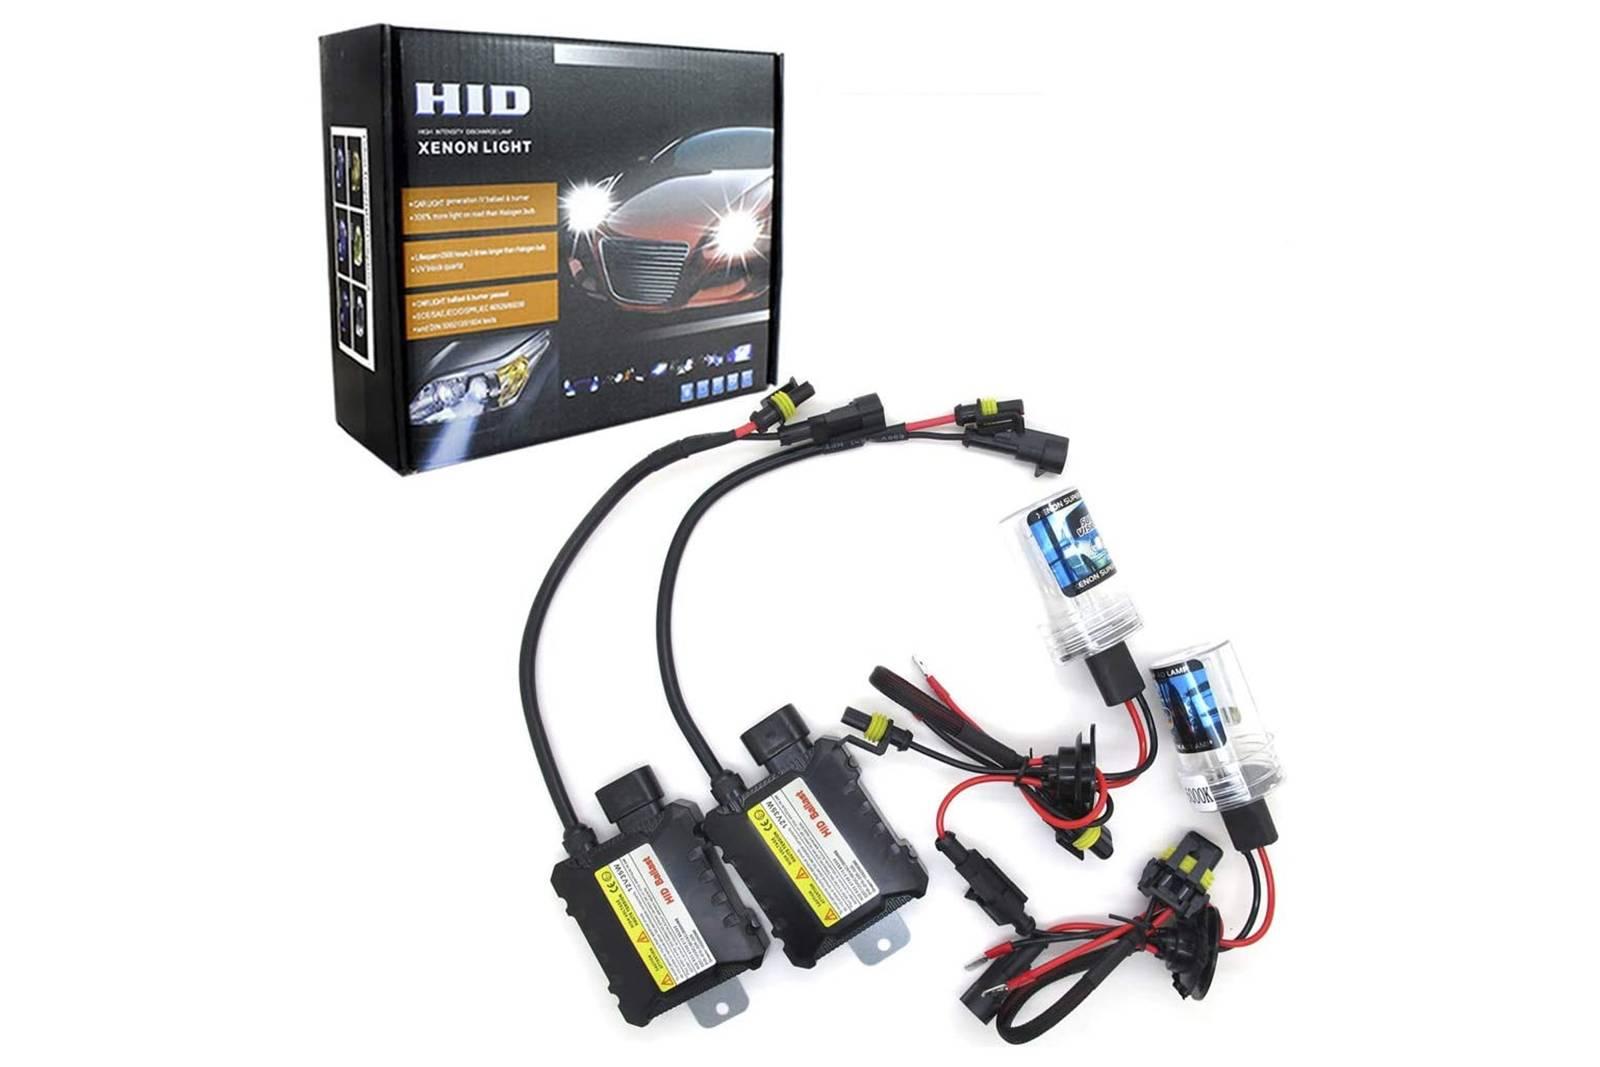 HID Xenon Headlight Kit H11 Bulbs & Ballasts Canbus 8000K